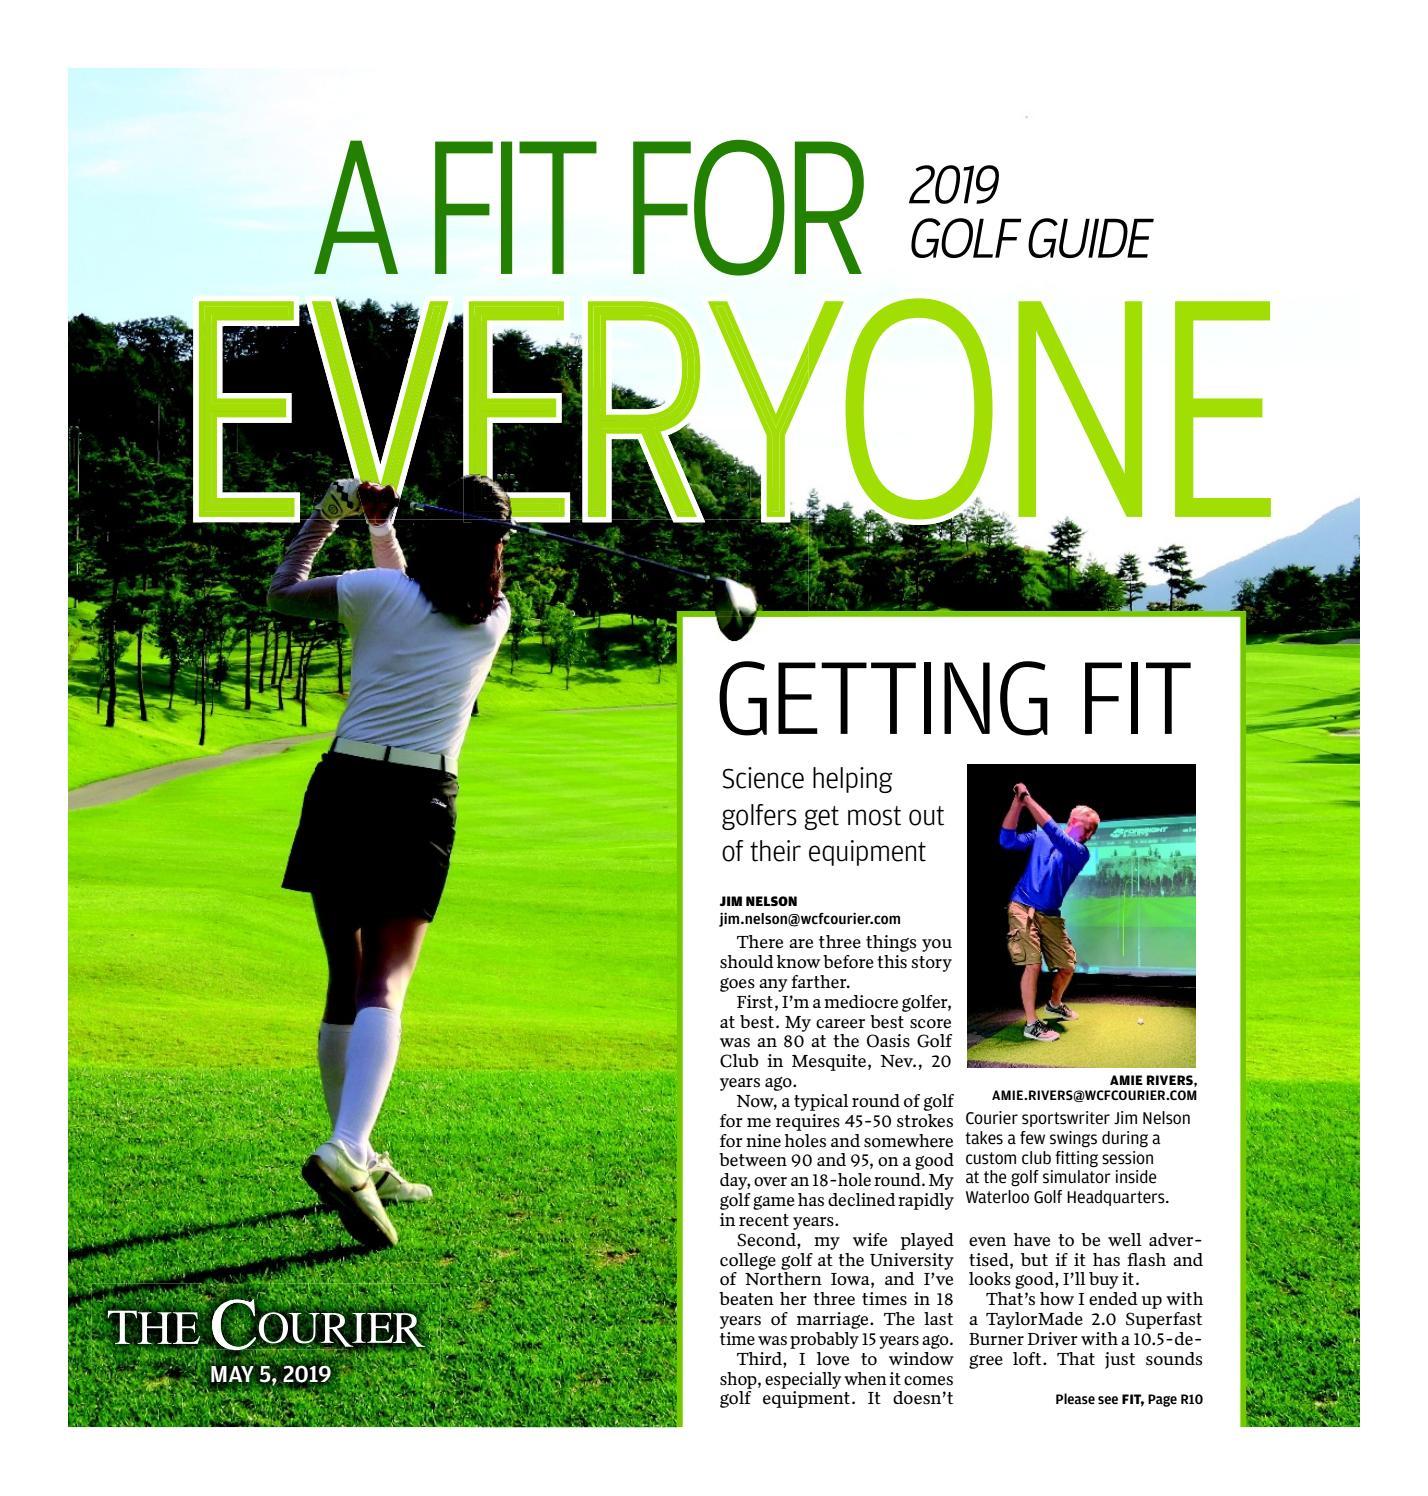 Golf Guide 2019 by Waterloo-Cedar Falls Courier - issuu